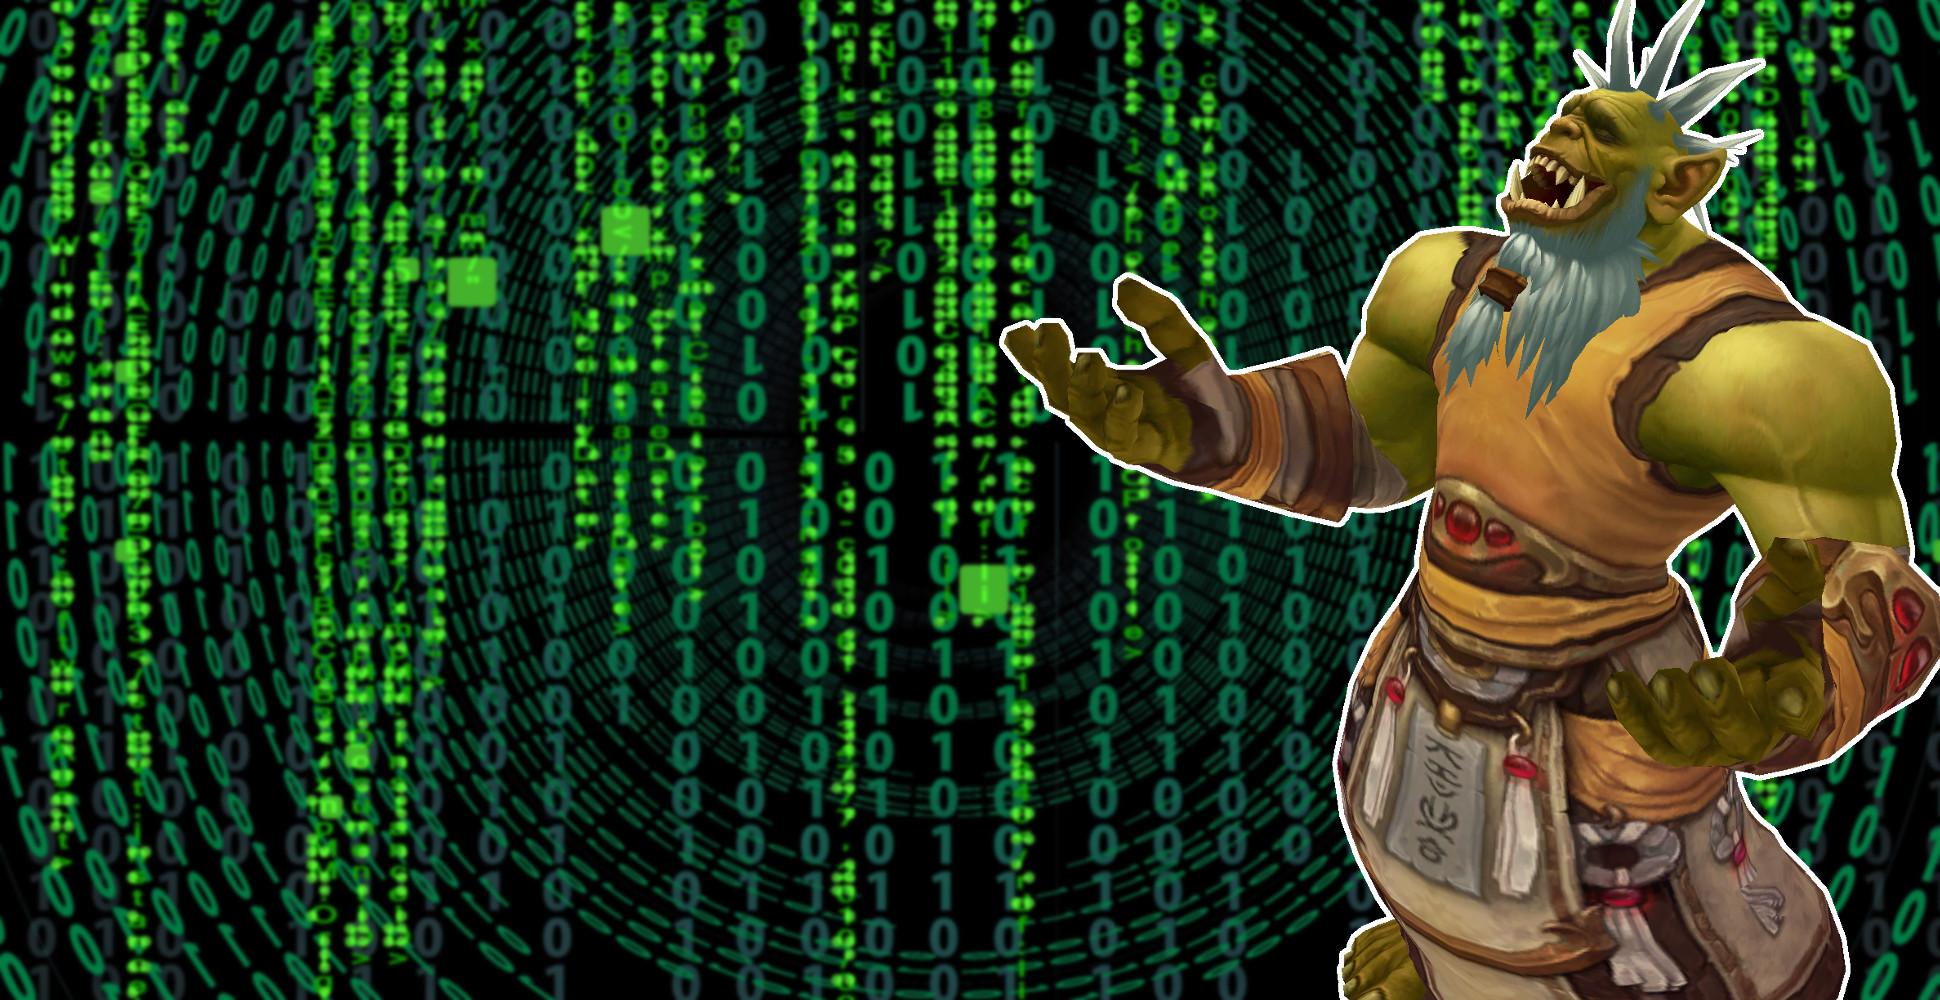 WoW DDOS Heiler Limit Orc Shaman Laughing matrix title